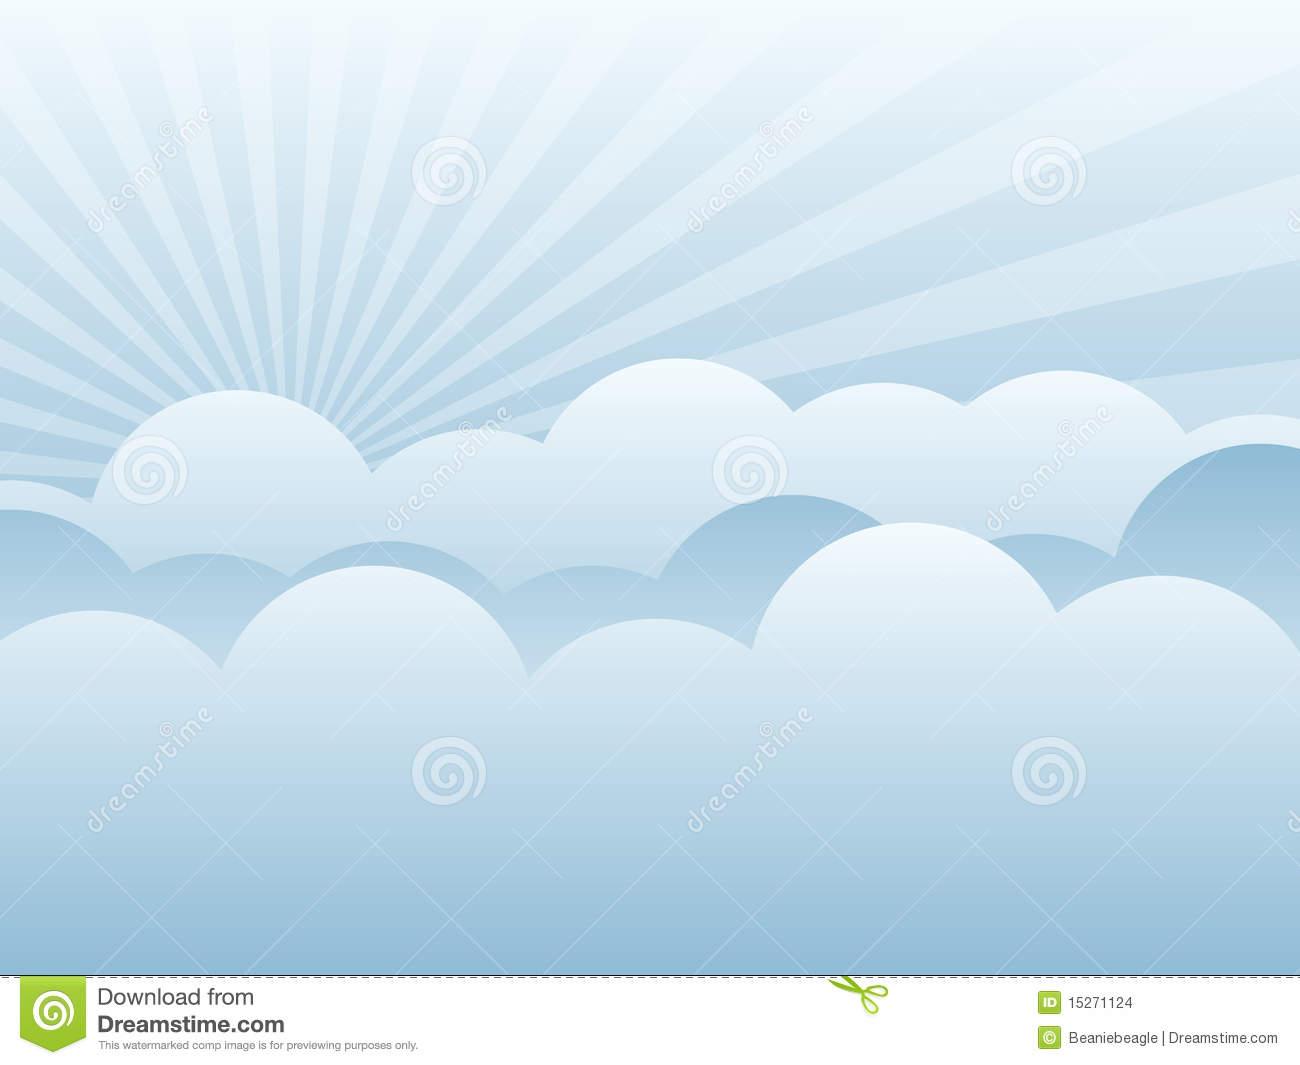 Clouds clipart light blue Stock EPS Images background Cloud